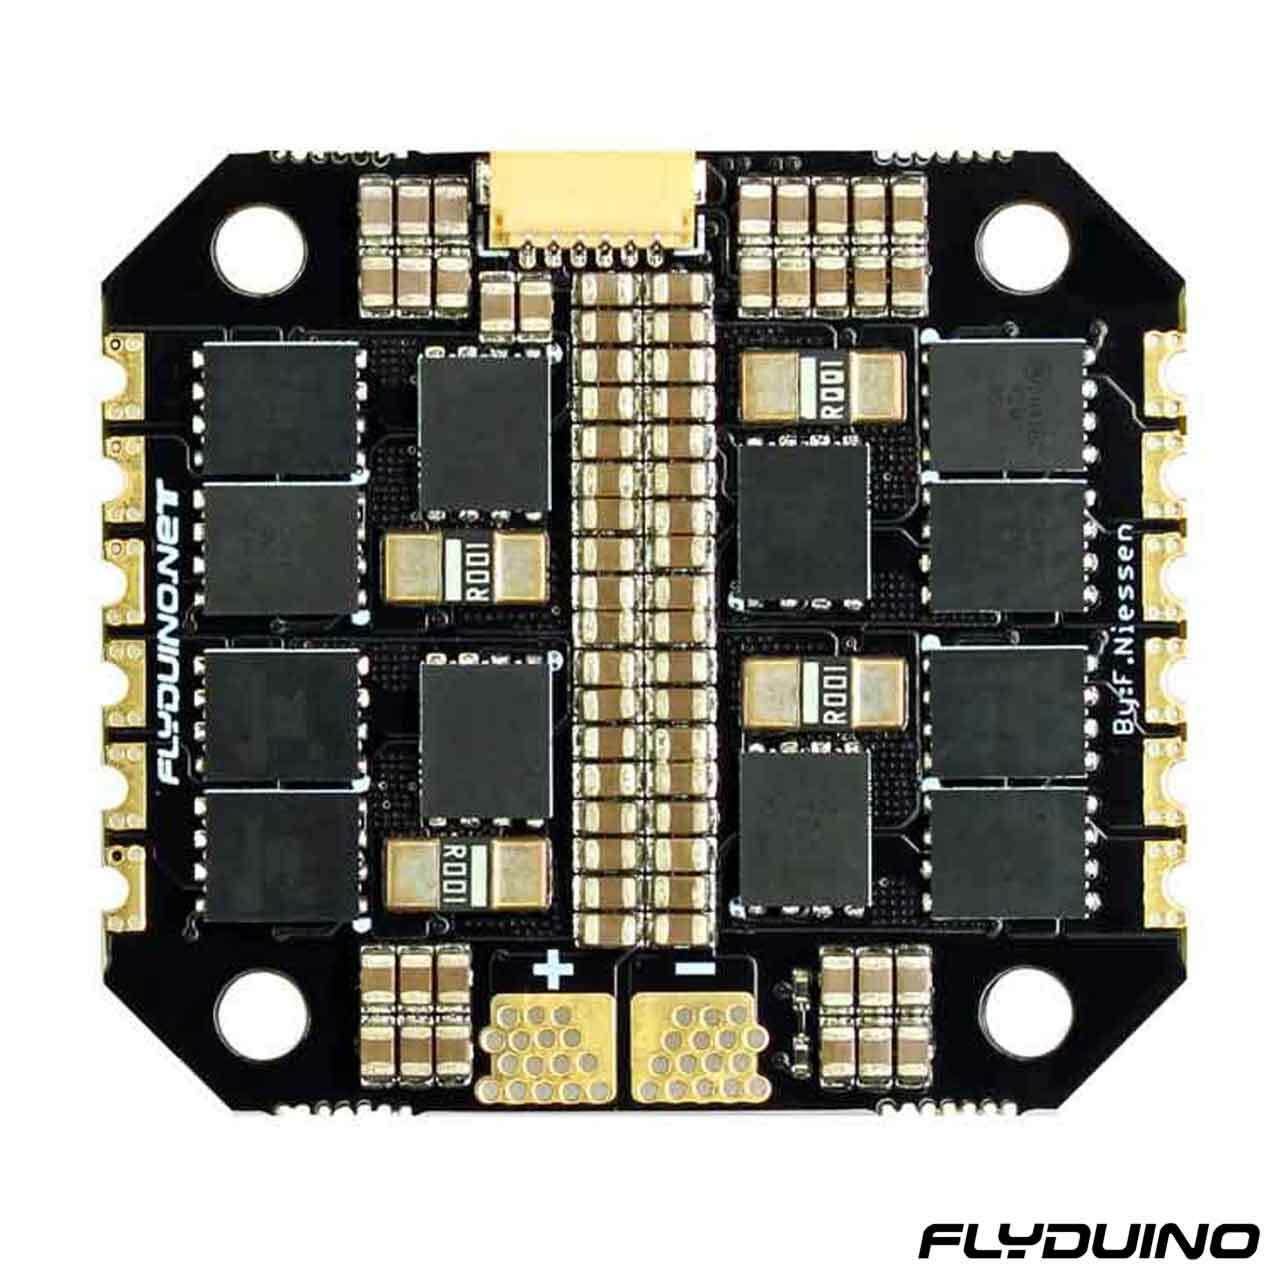 FLYDUINO KISS ESC 2-5S 25A 4in1 (40A limit) - 32bit brushless Motor Ctrl